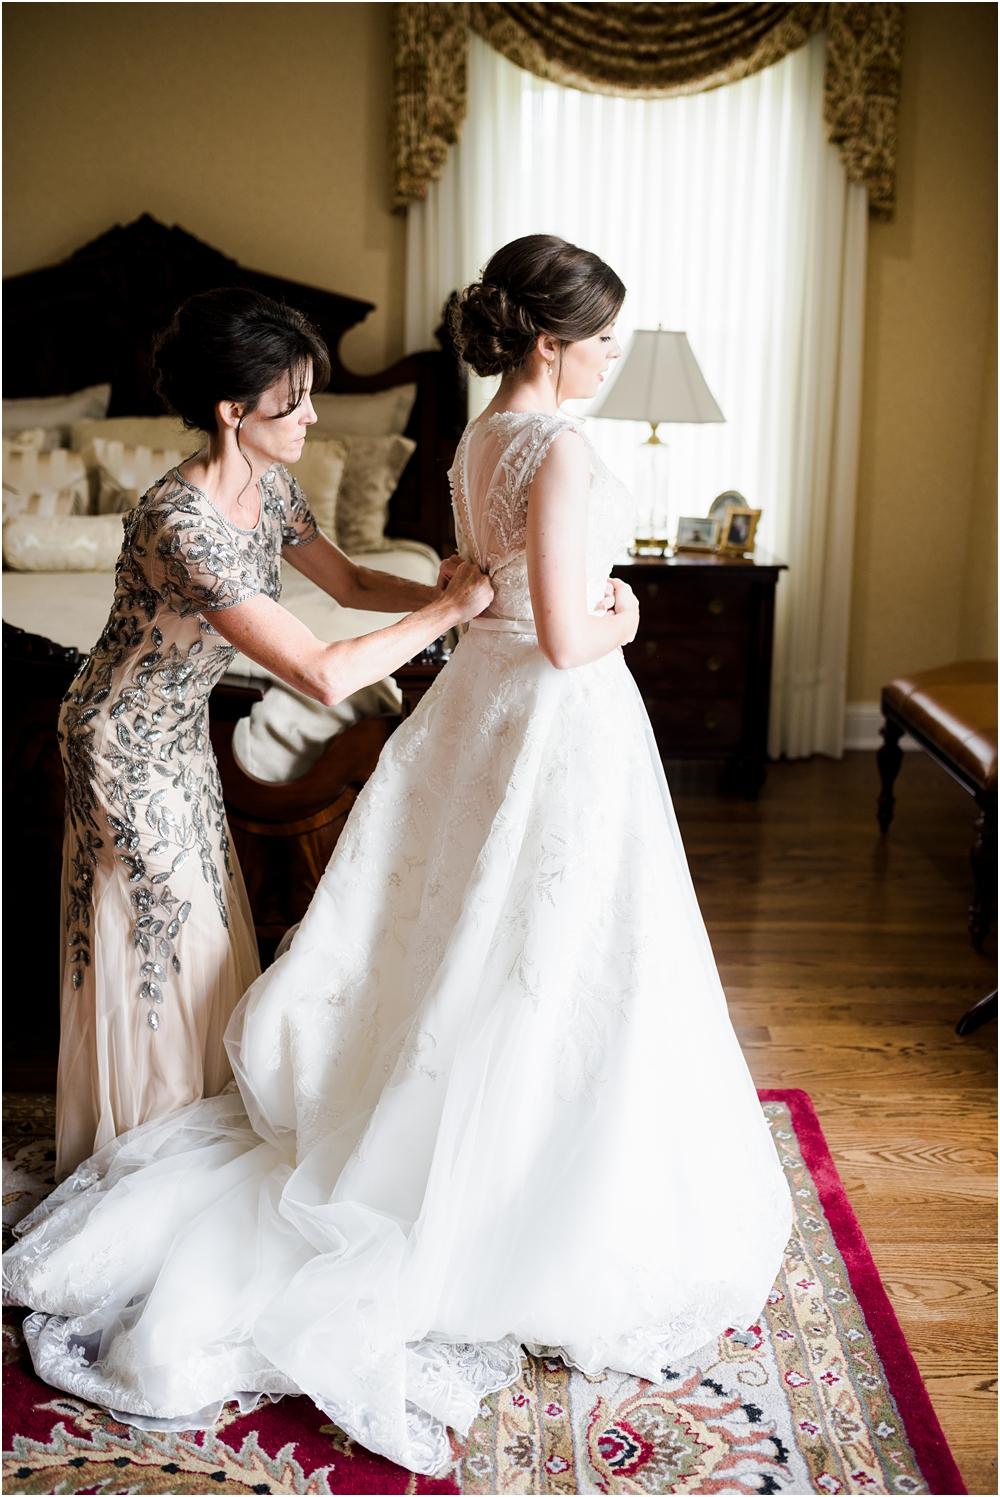 marianna-florida-wedding-photographer-kiersten-grant-24.jpg